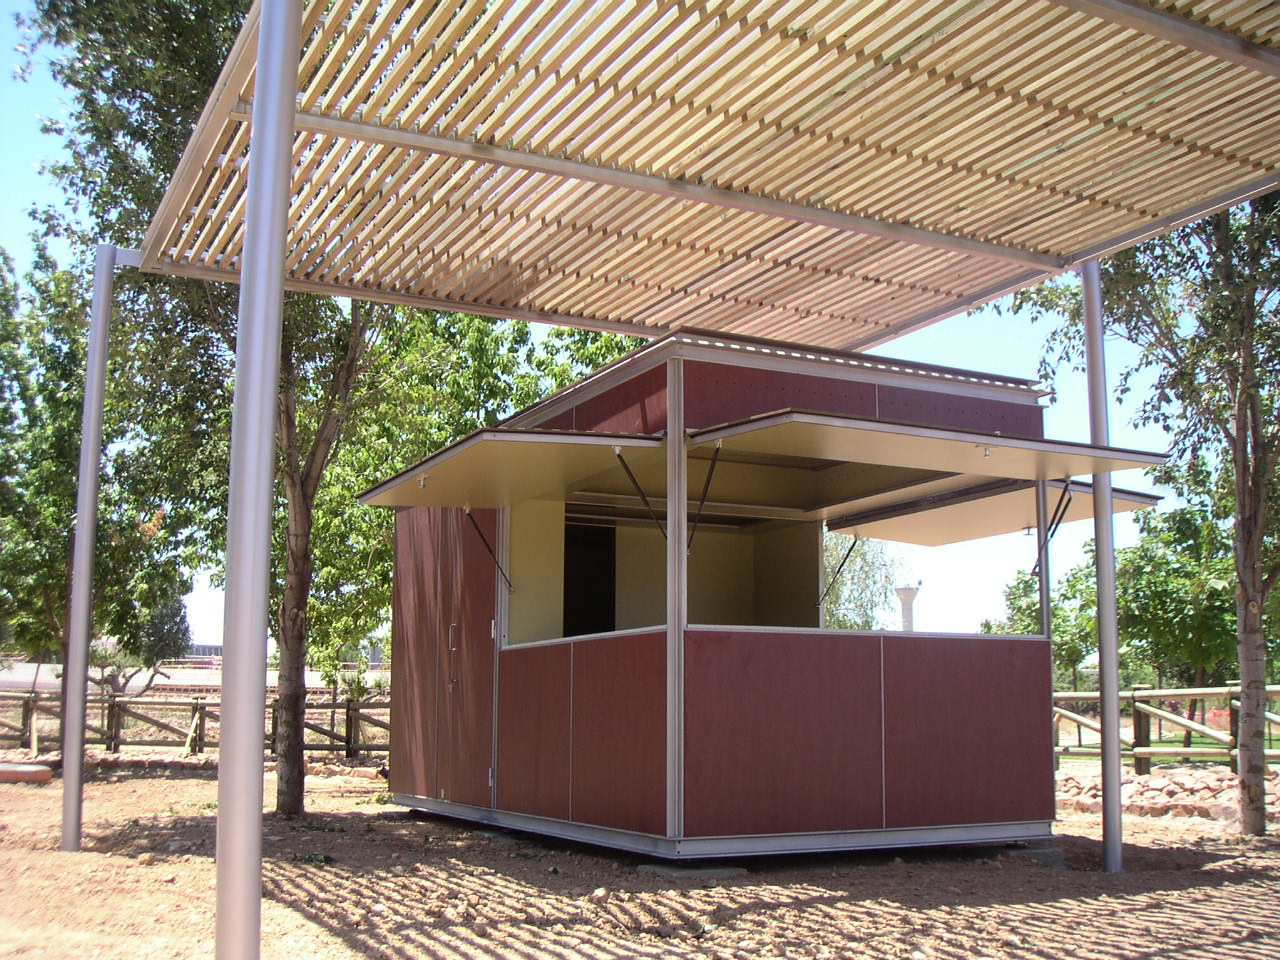 Urbadis by microarquitectura